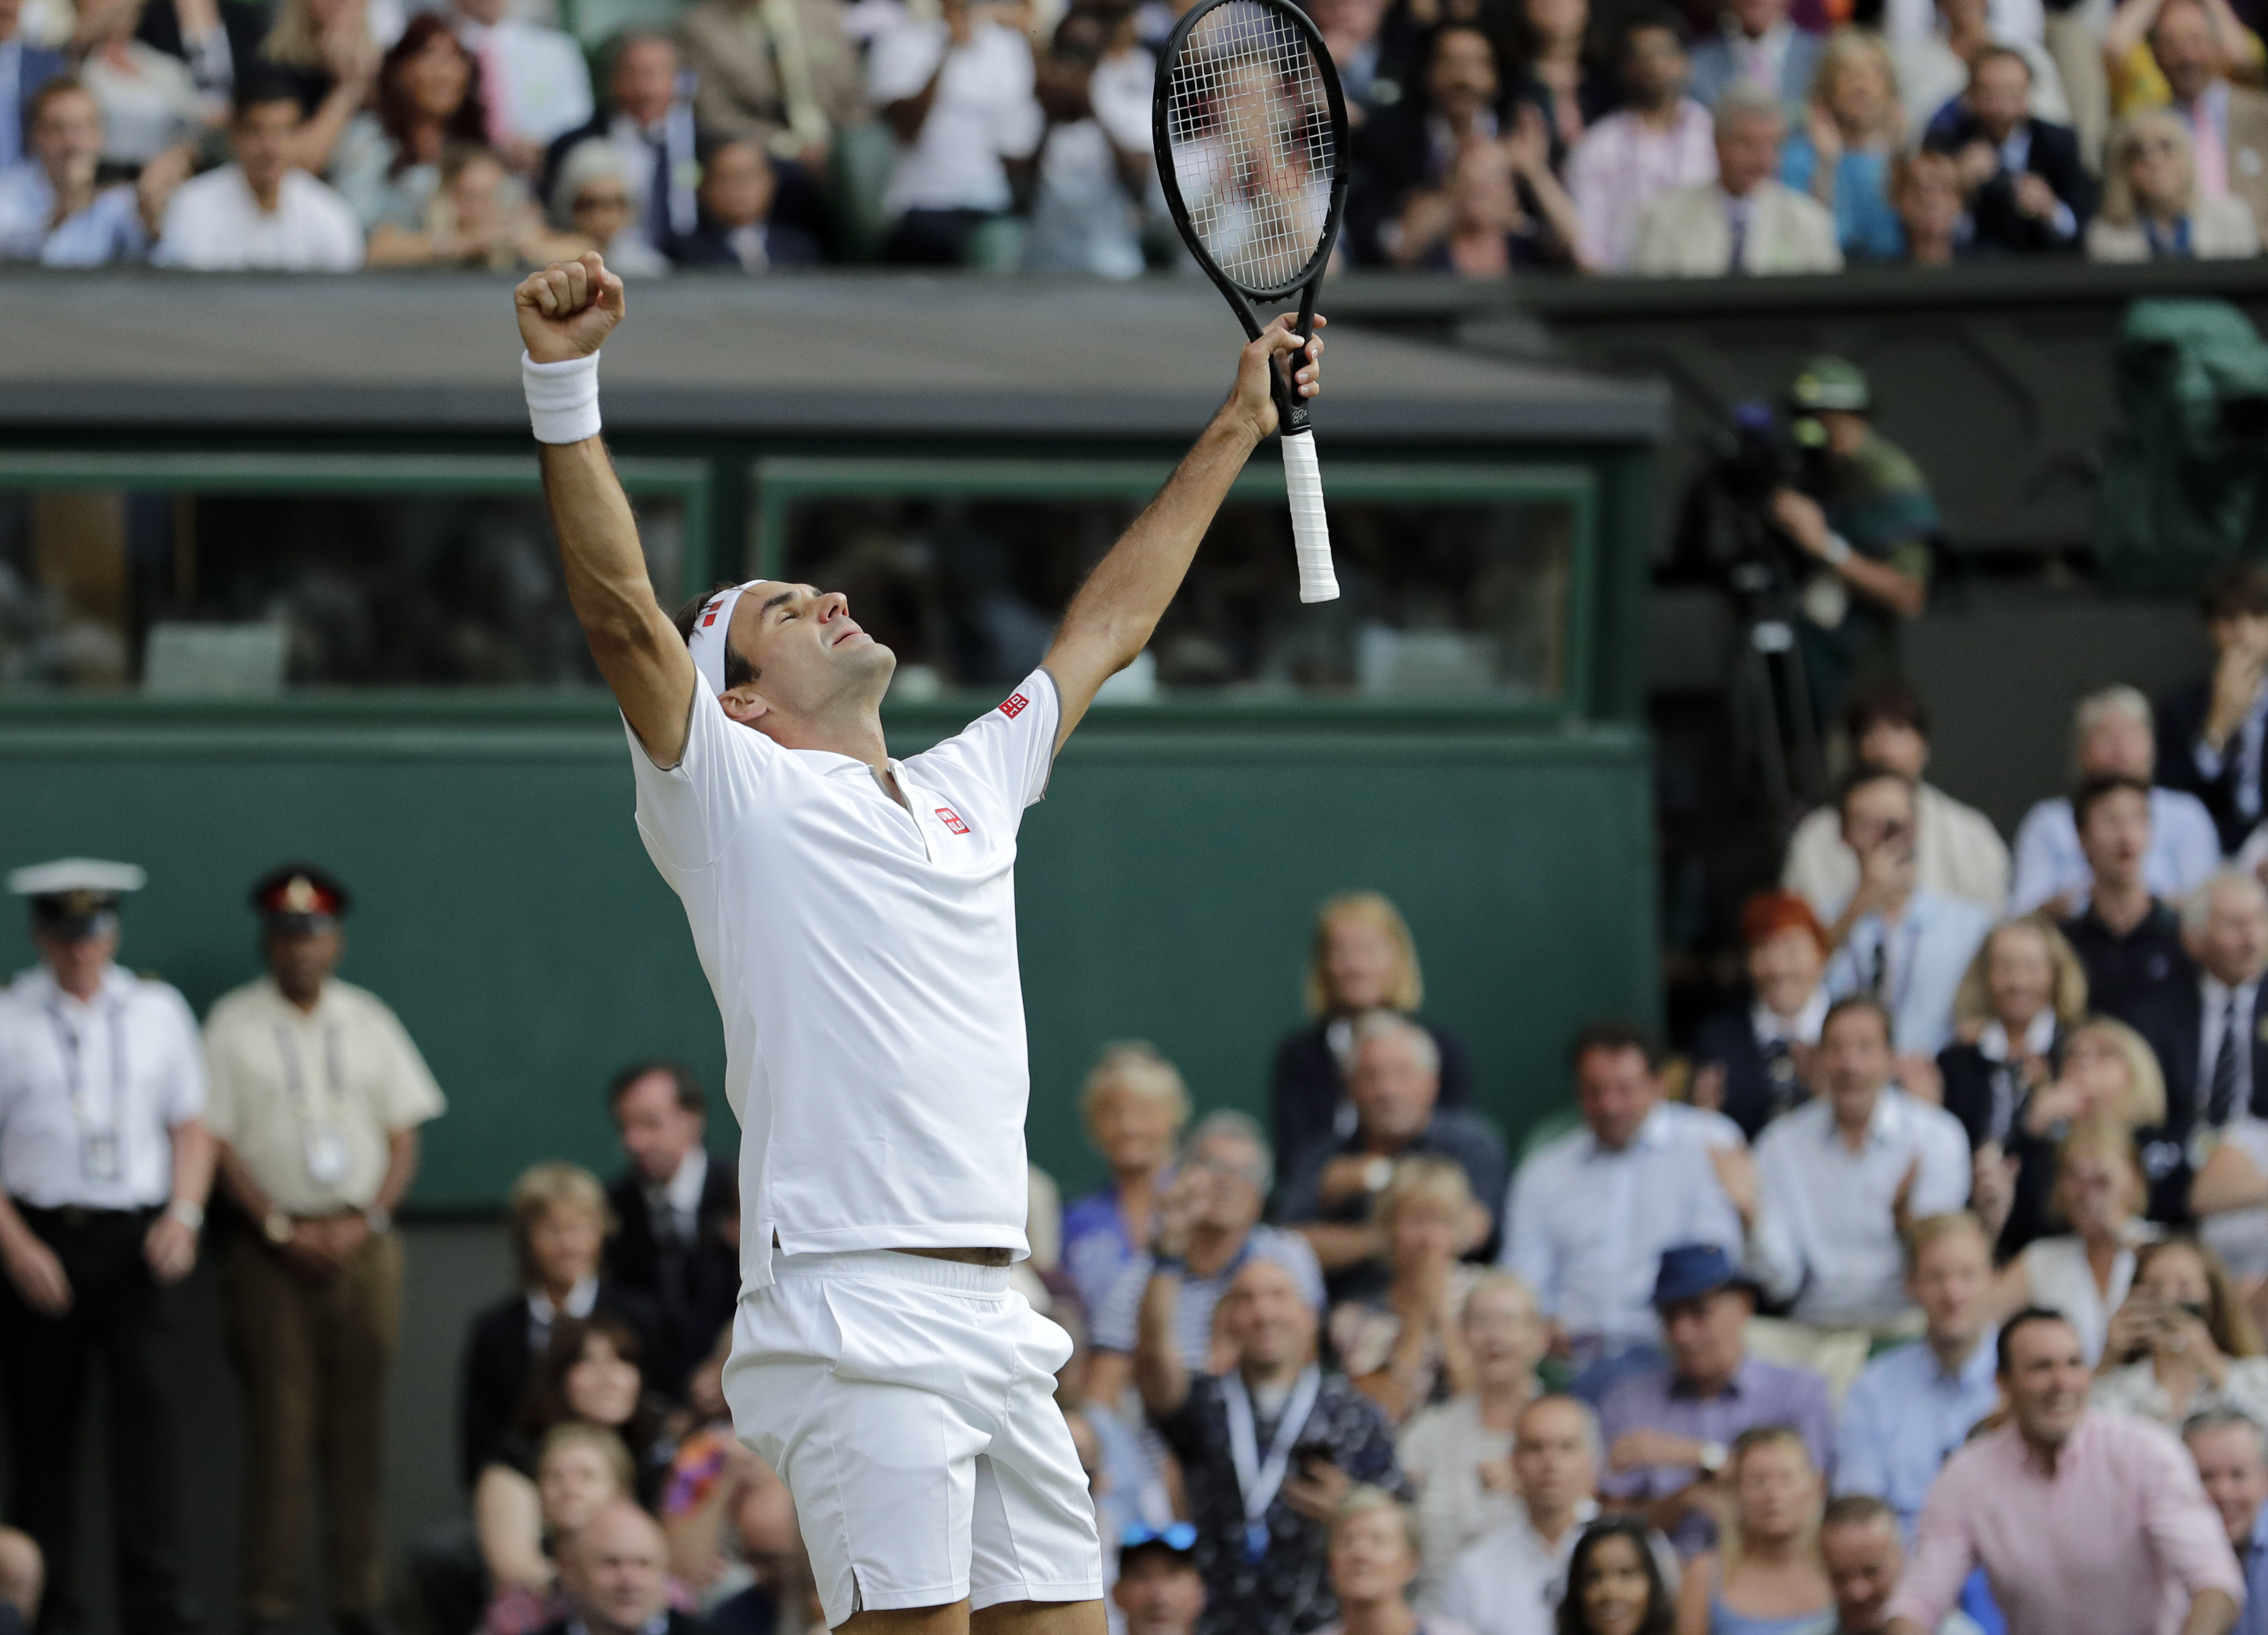 Federer celebrates victory. Image: PA Images